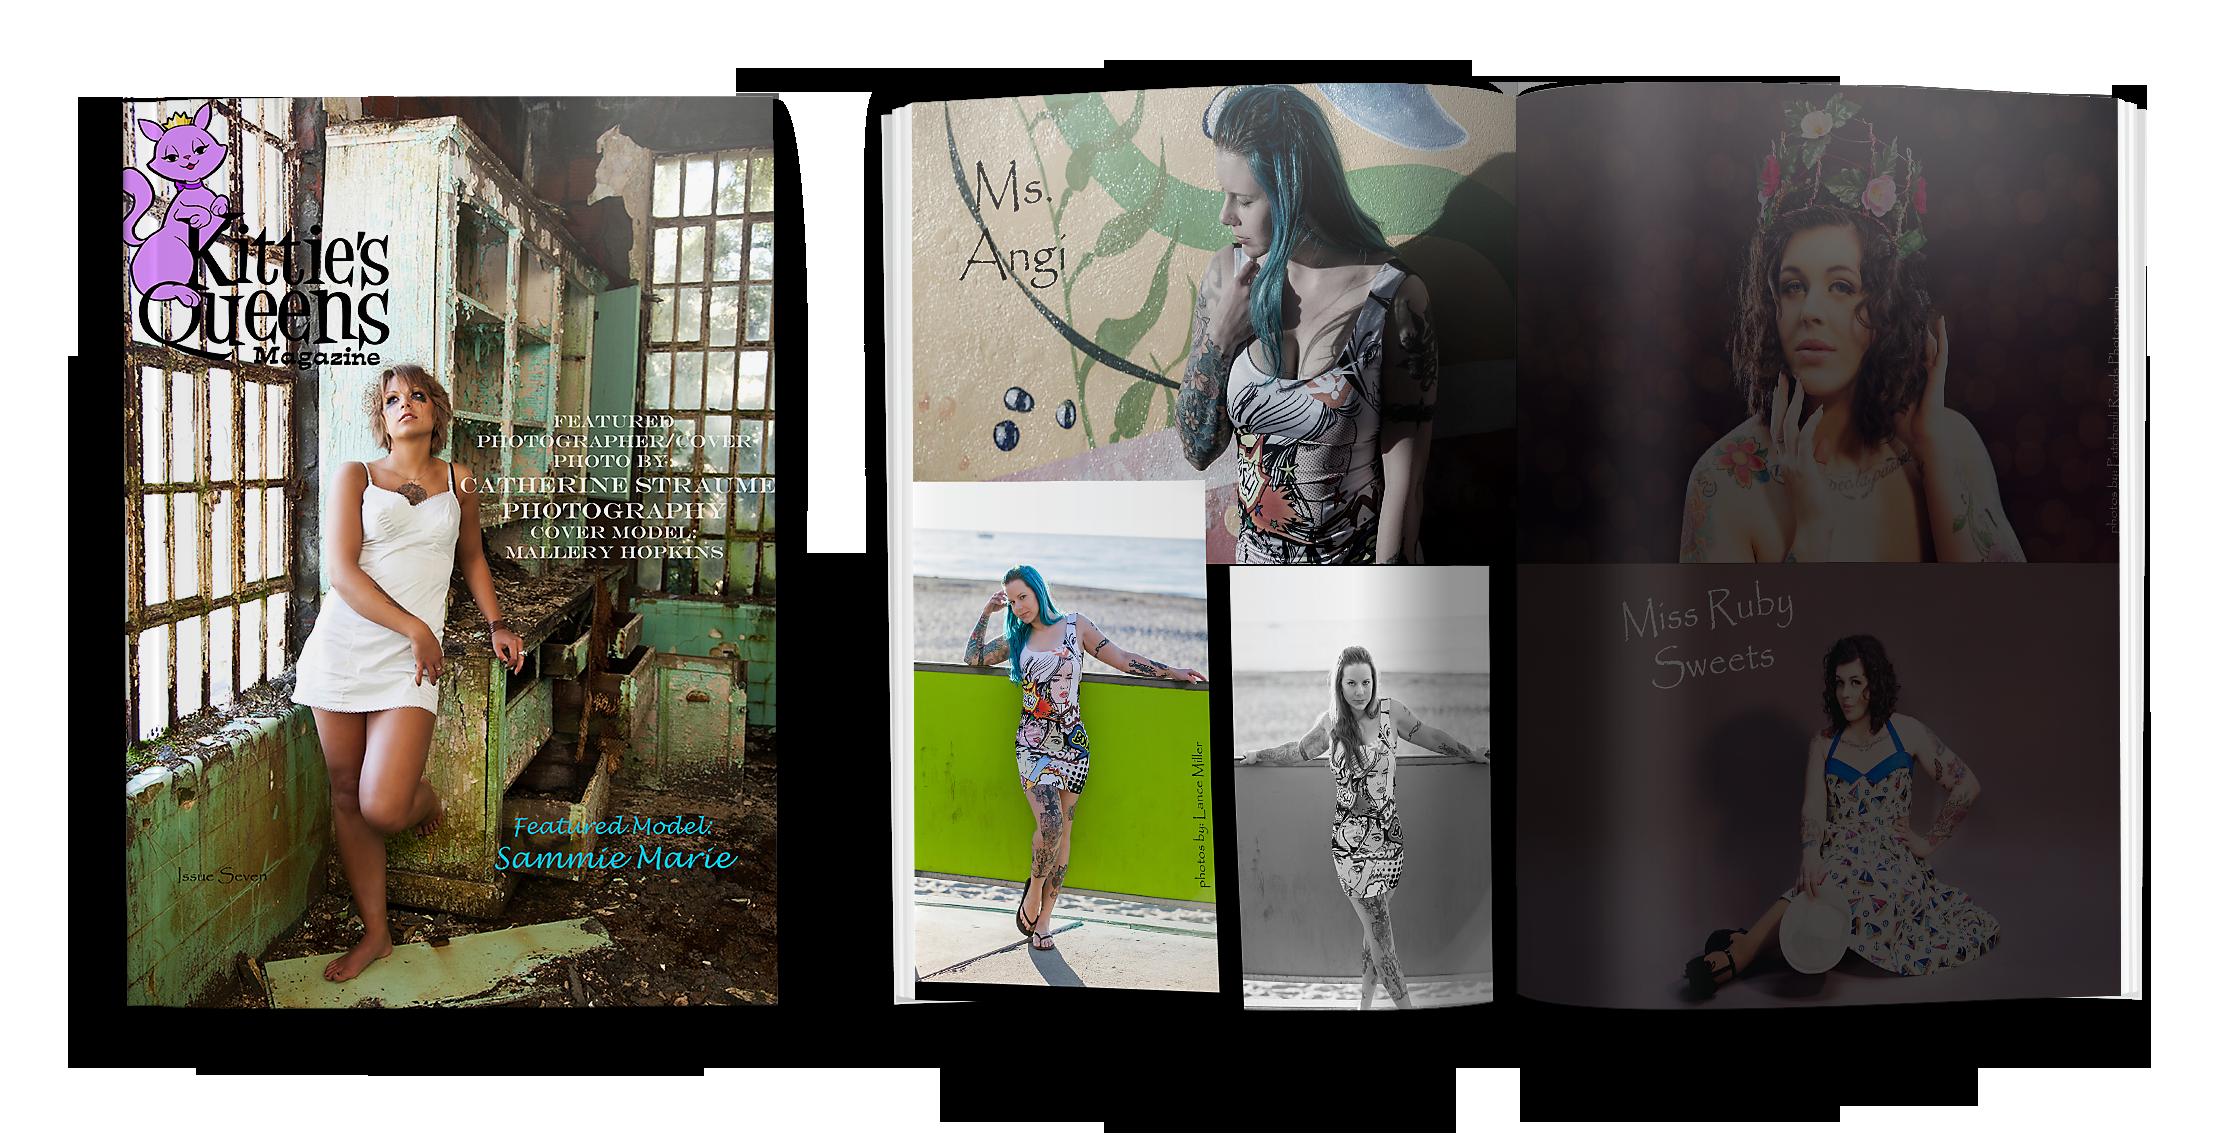 kittie_s_queens_magazine_issue_seven_render1.png